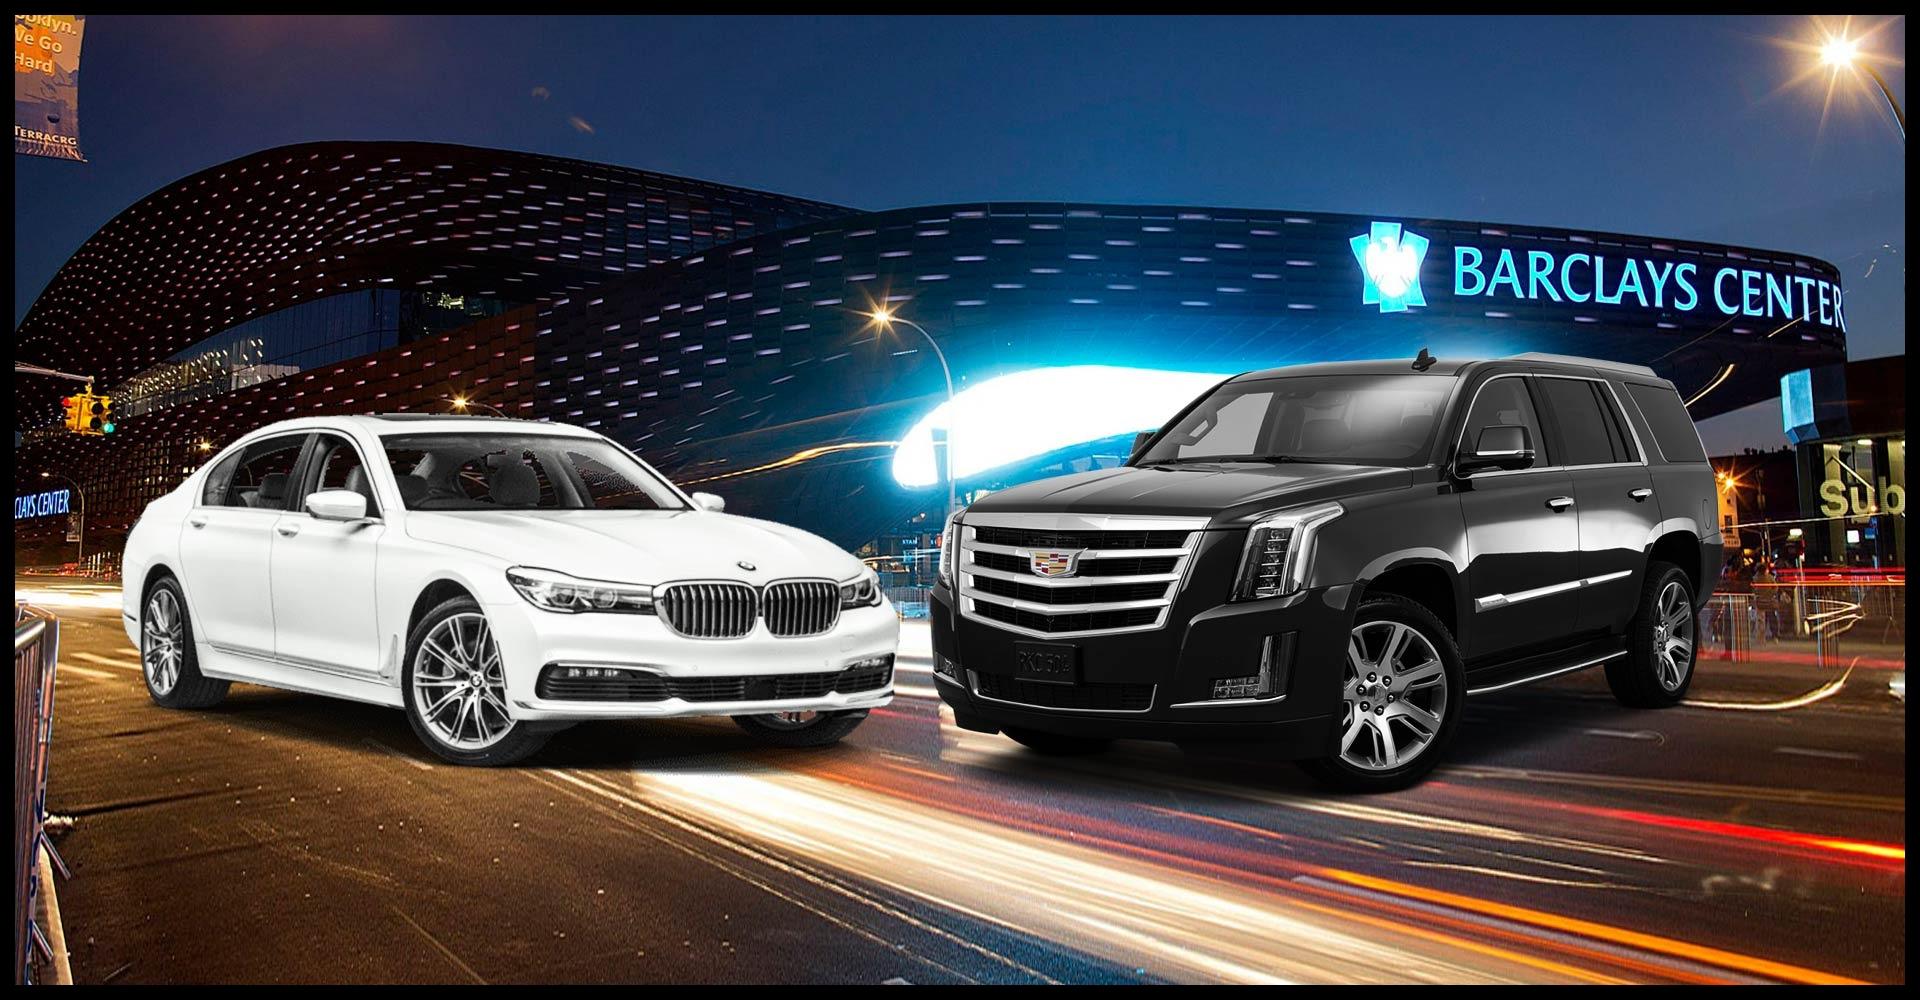 Auto City Cars for Sale Luxury Prime Drive Inc Richmond Va